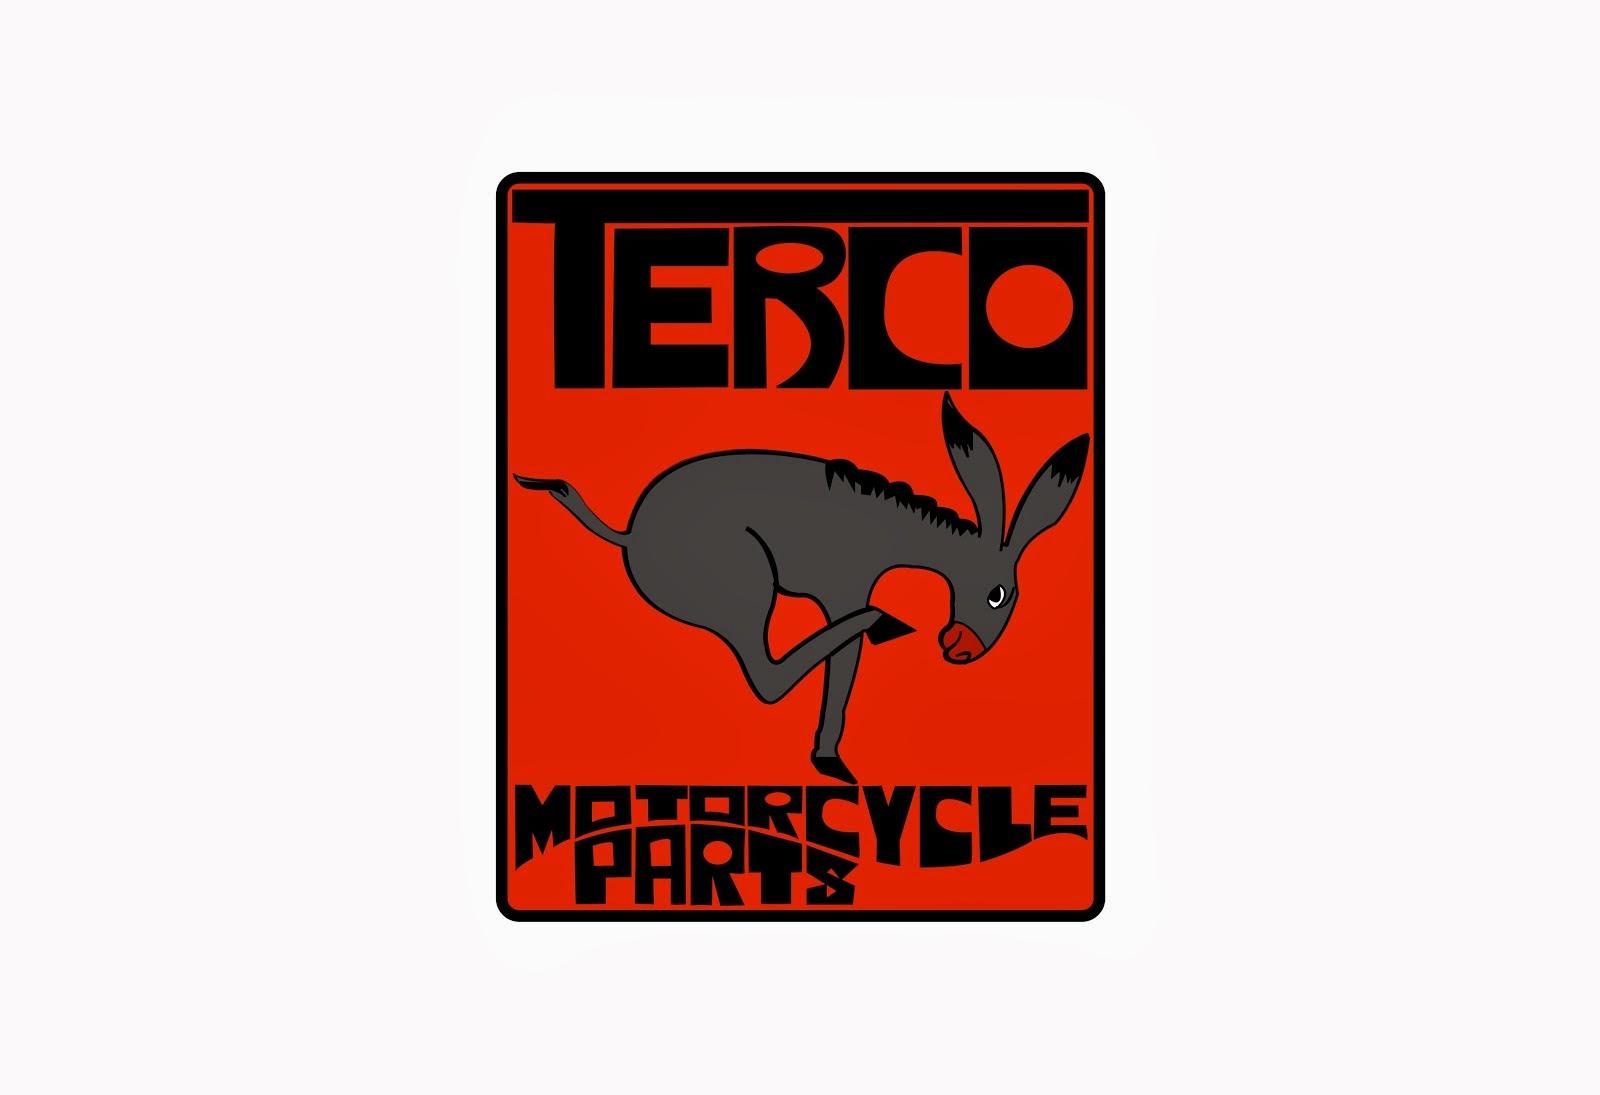 Terco shop